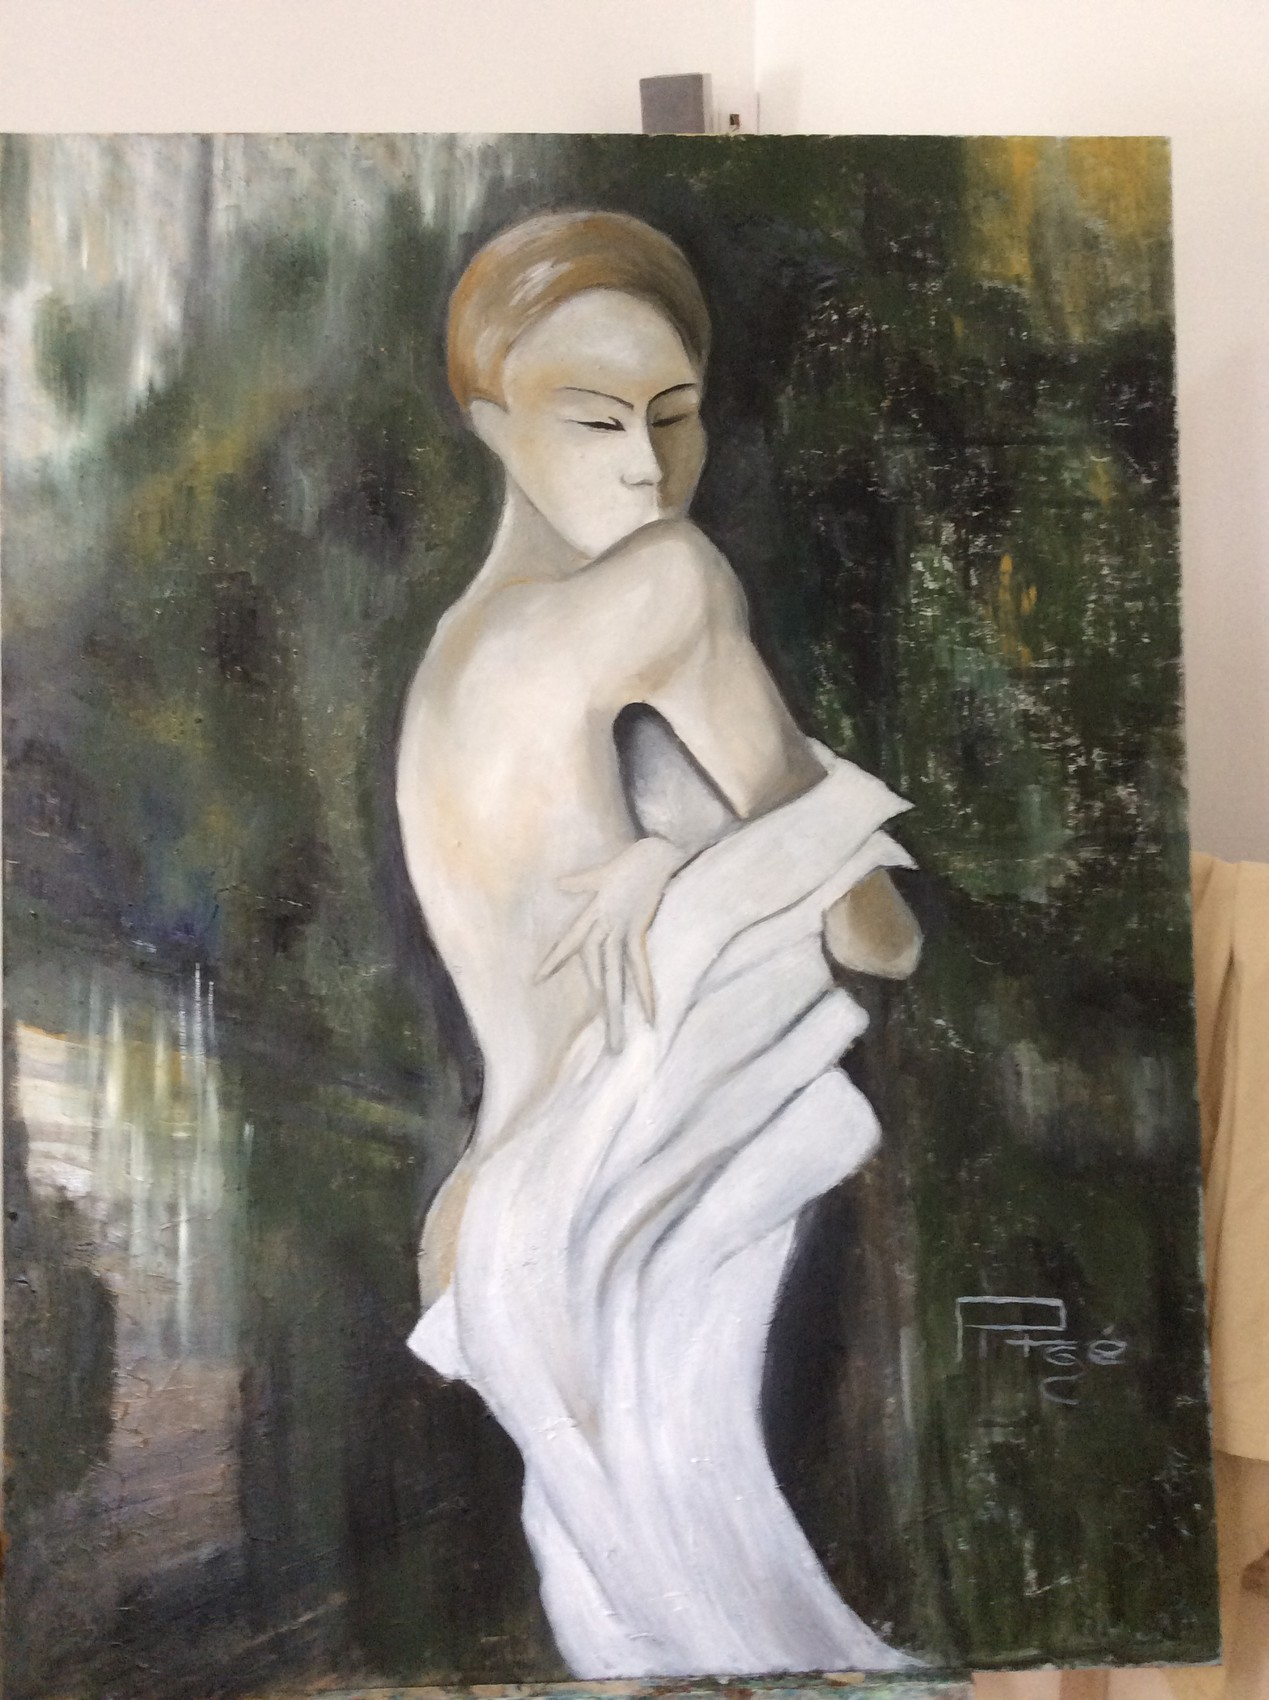 La fille au drap blanc